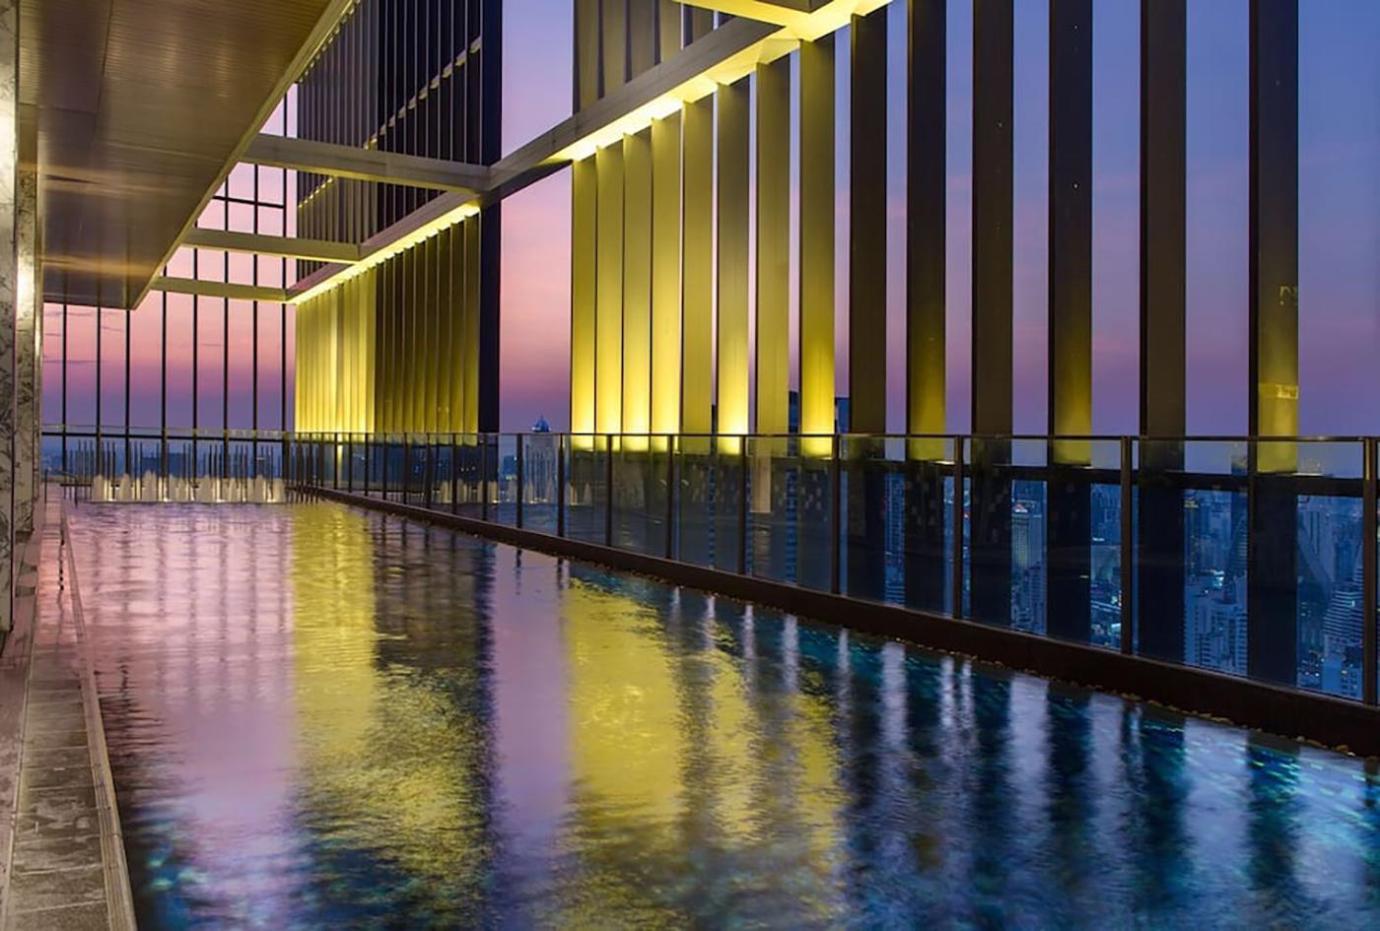 Park24 Luxury Sky swimming pool/BTS/One BR/40sqm Bangkok Bangkok Thailand